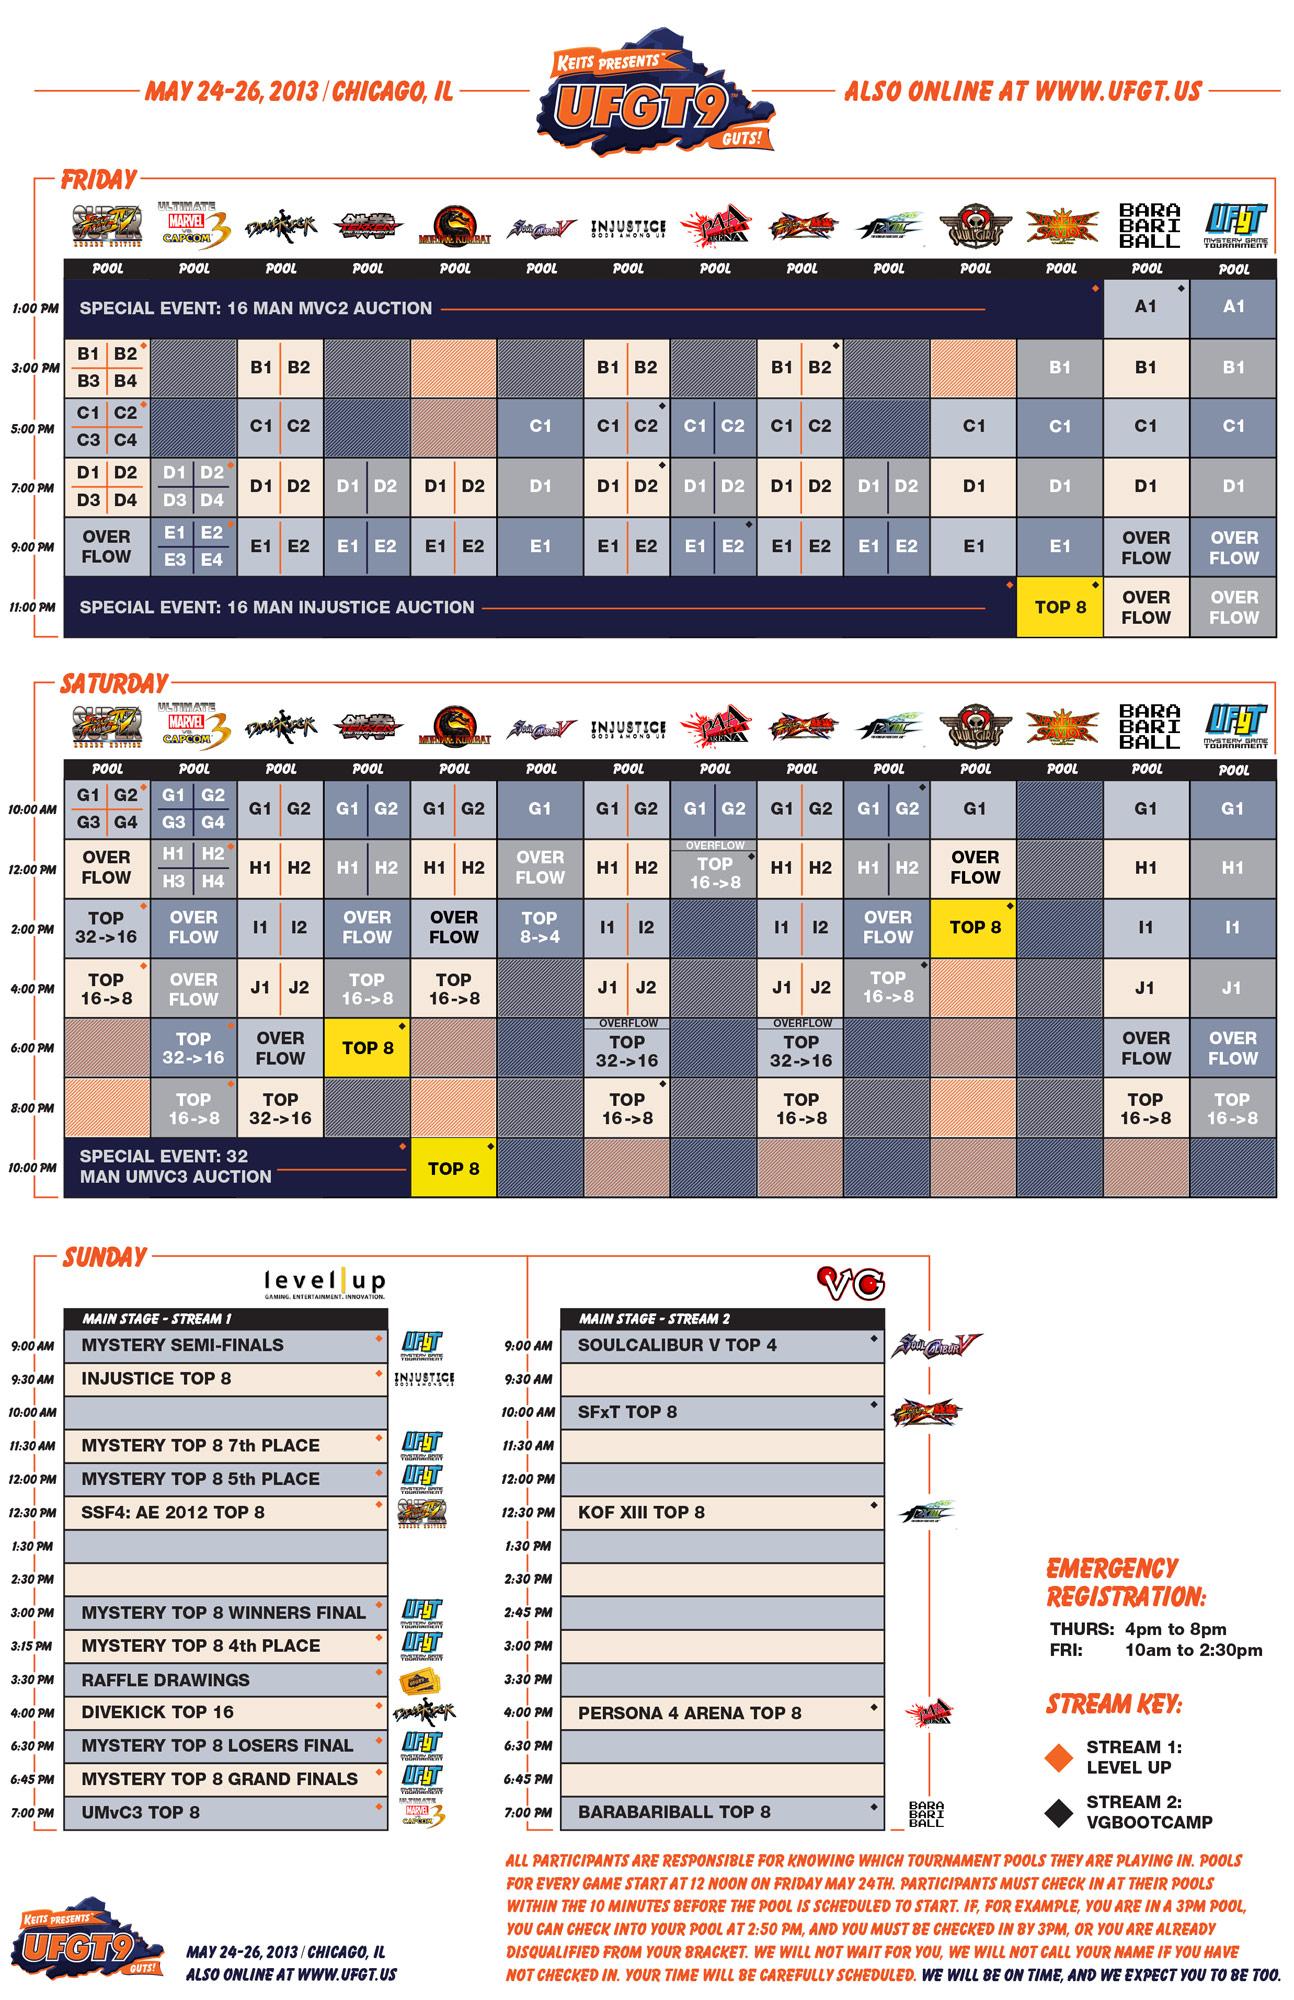 UFGT9 schedule